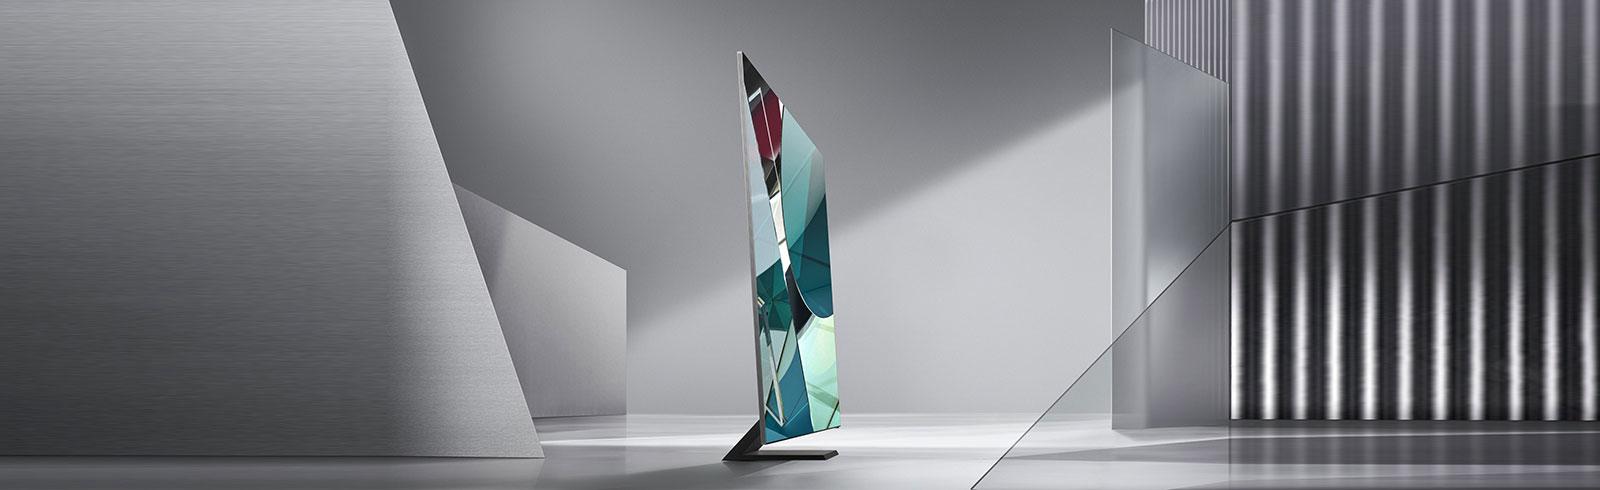 Samsung previews the Q950TS, Q900 and Q800TS 8K OLED TV series